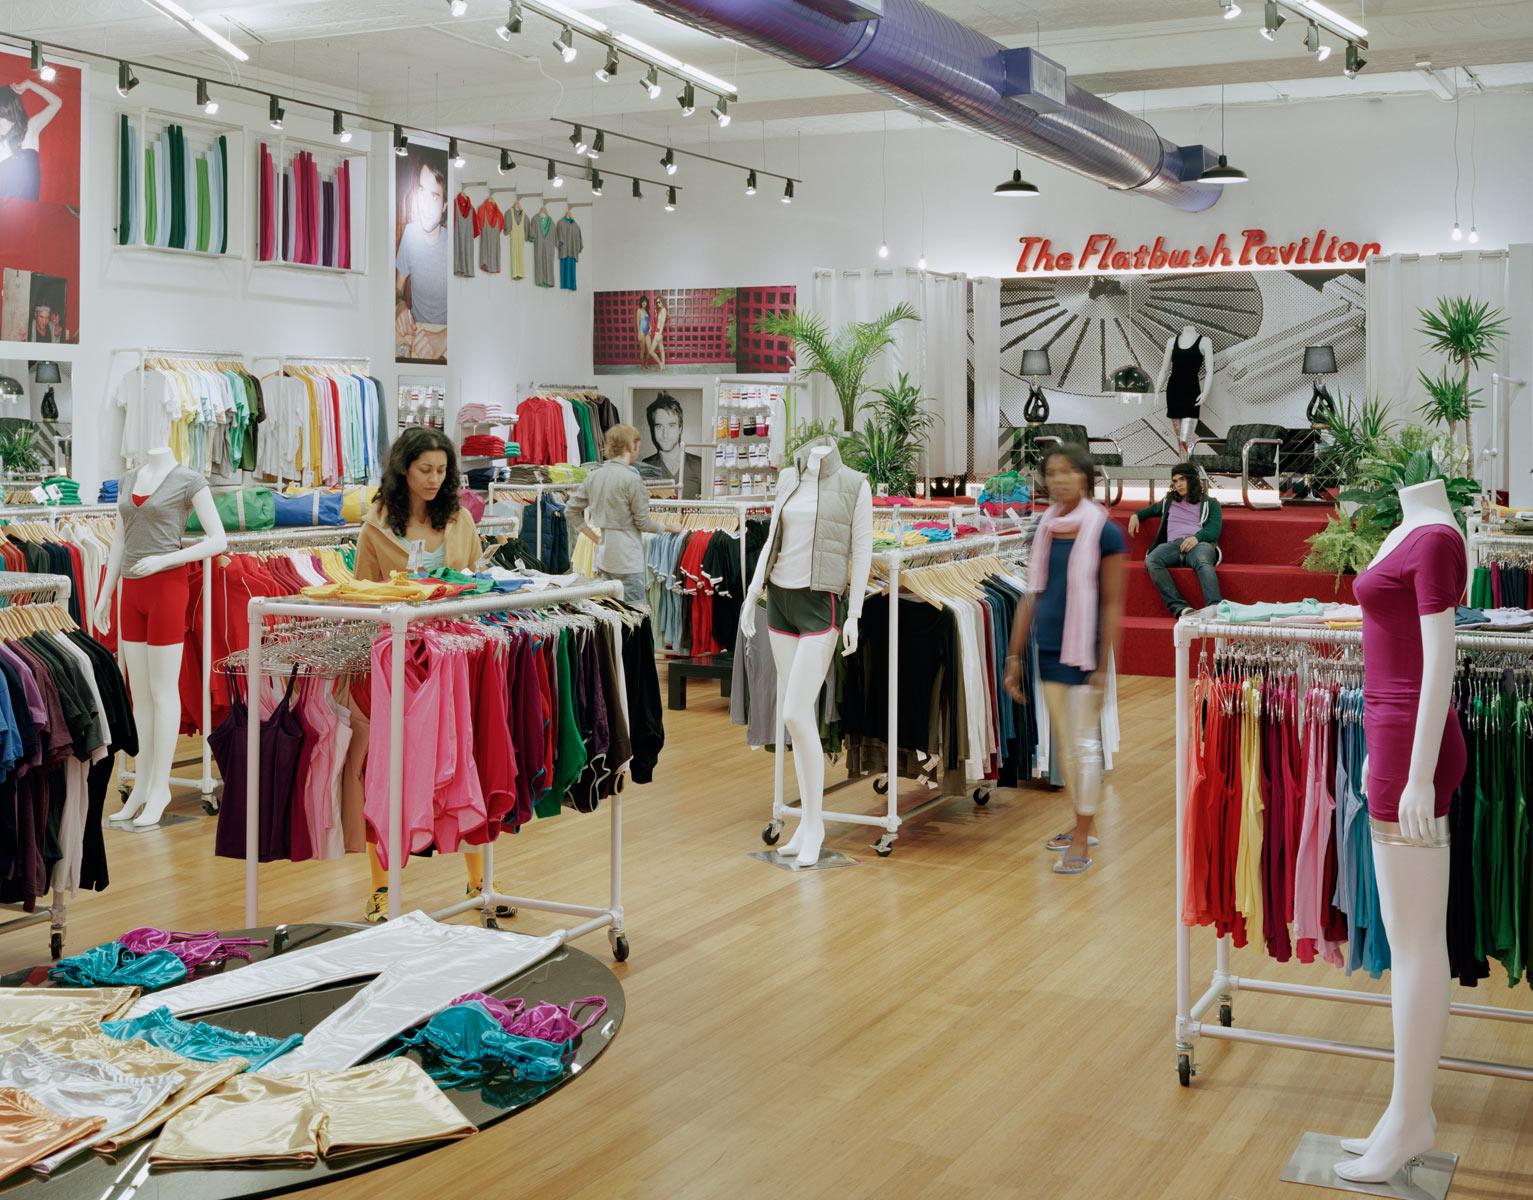 https://storify.com/kroessler/american-apparel-s-store-layout